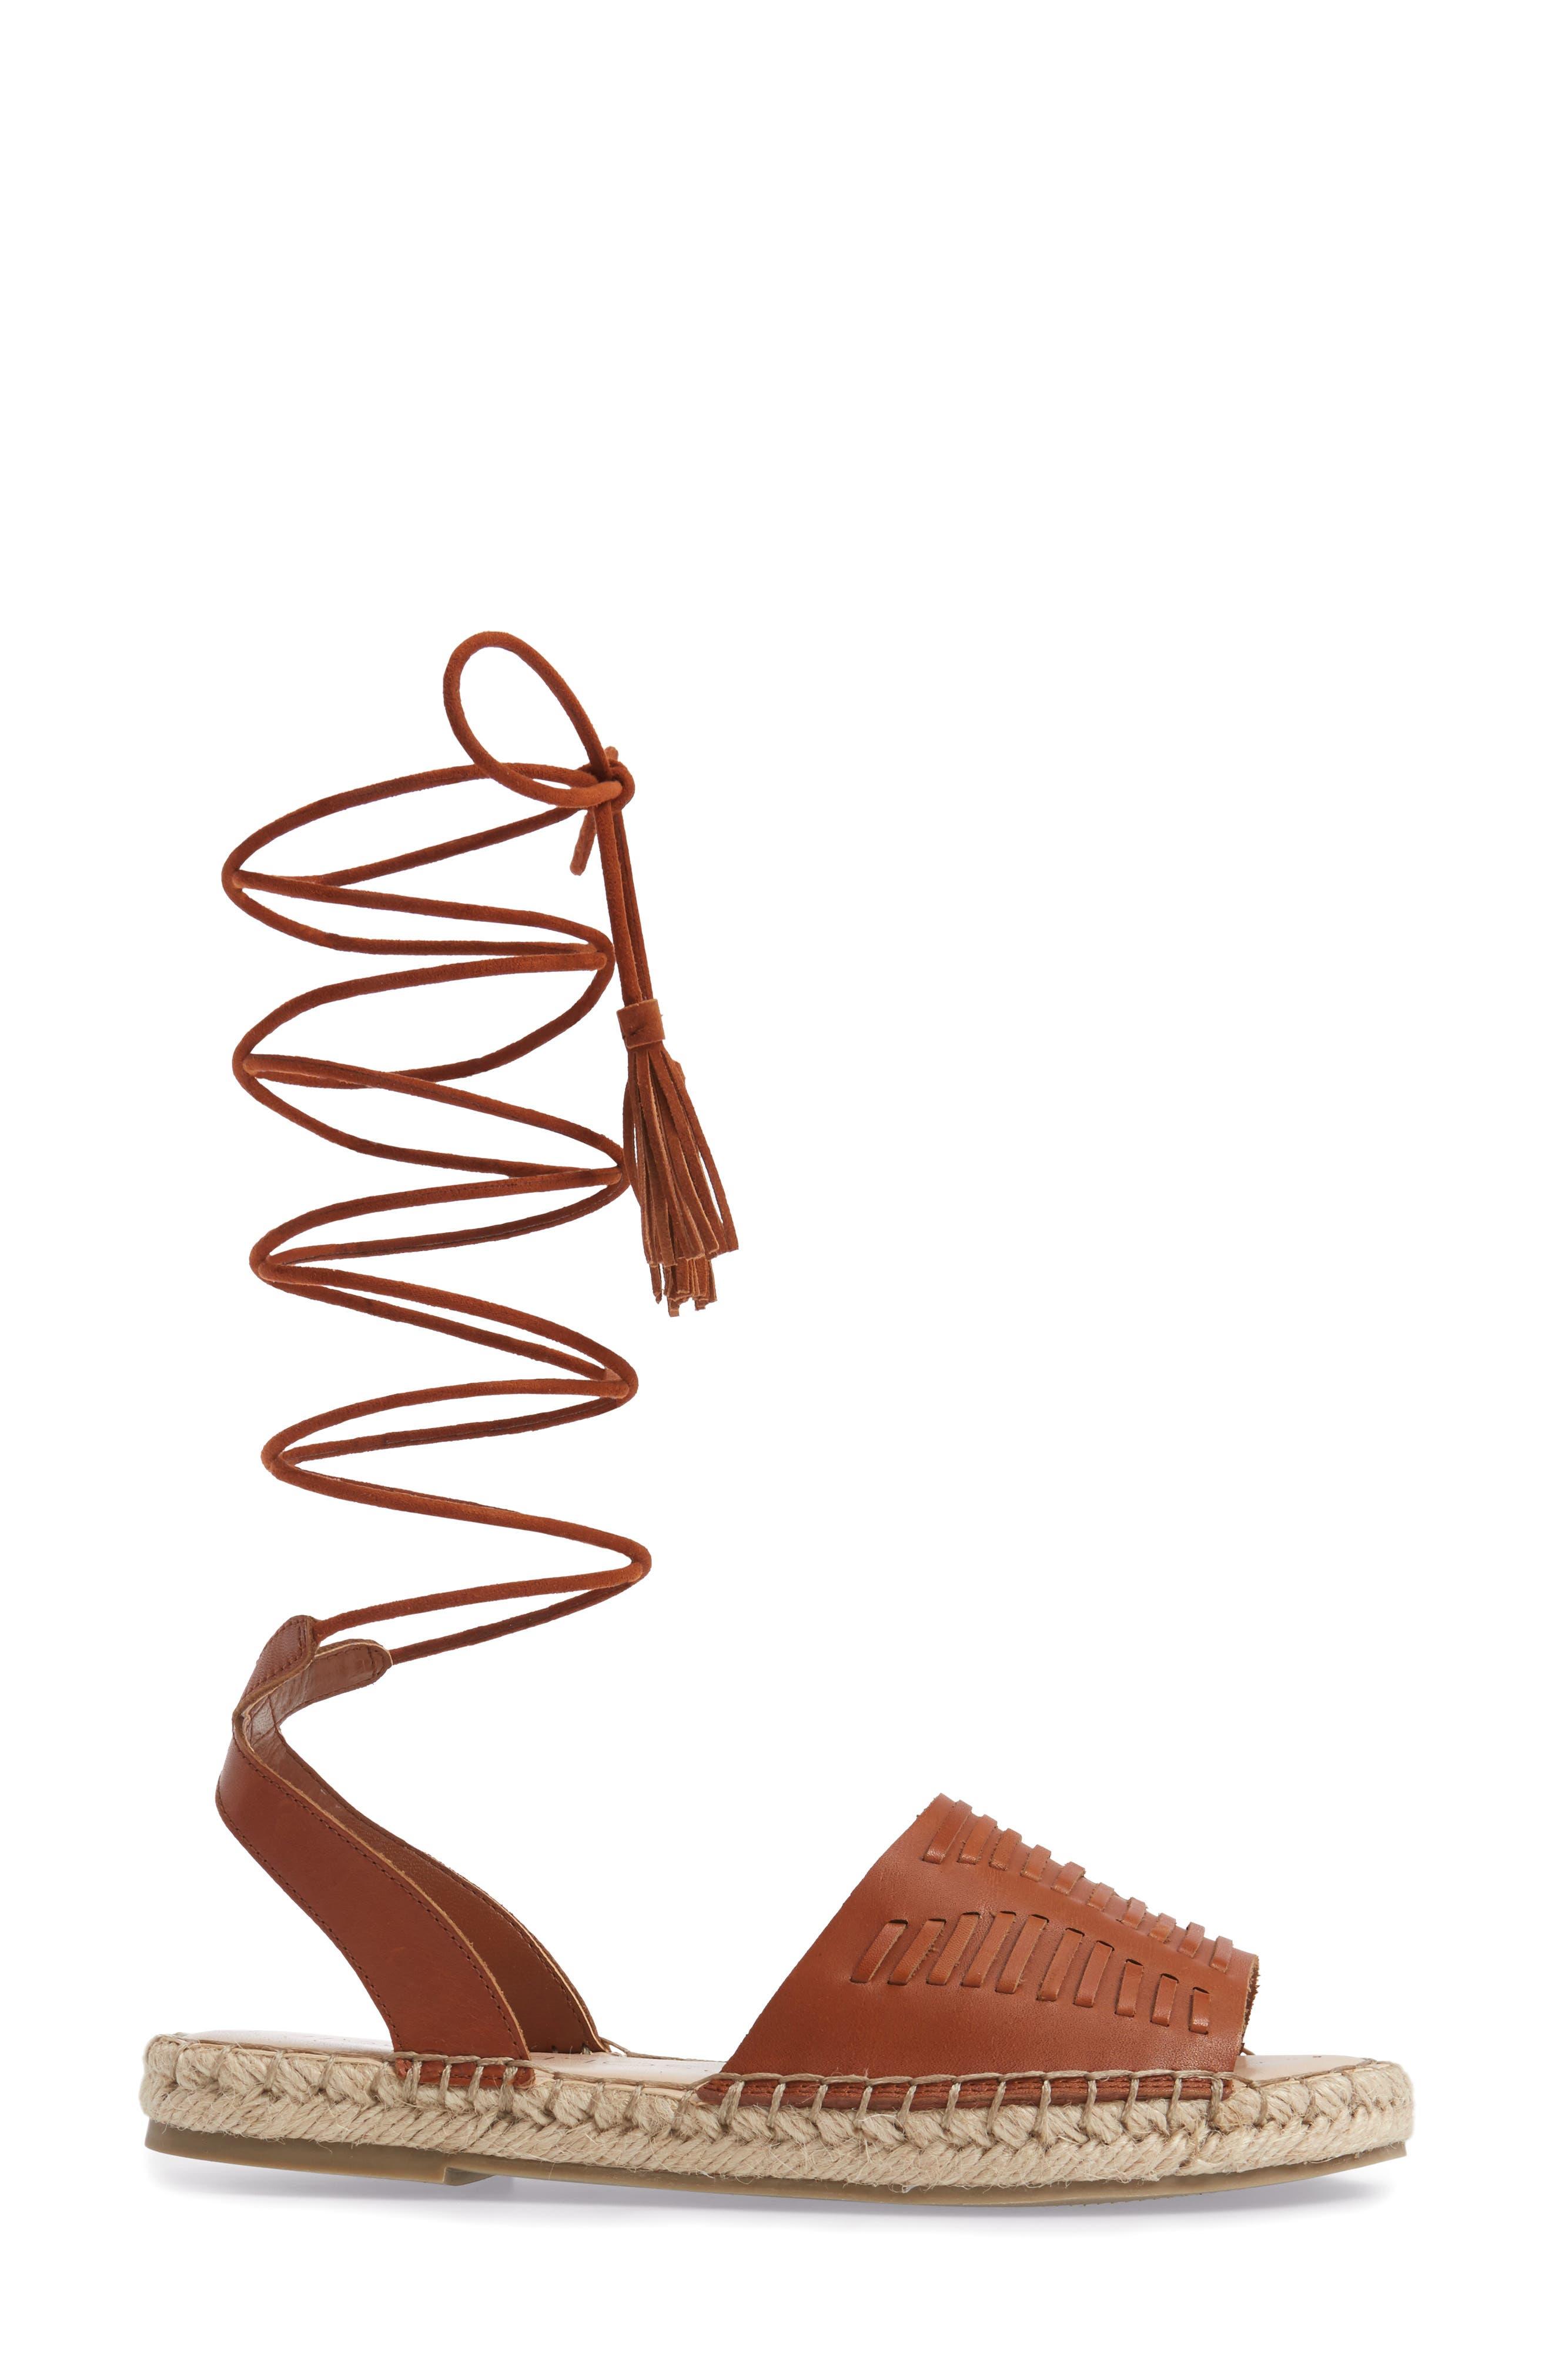 Clover Ankle Wrap Espadrille Sandal,                             Alternate thumbnail 3, color,                             212